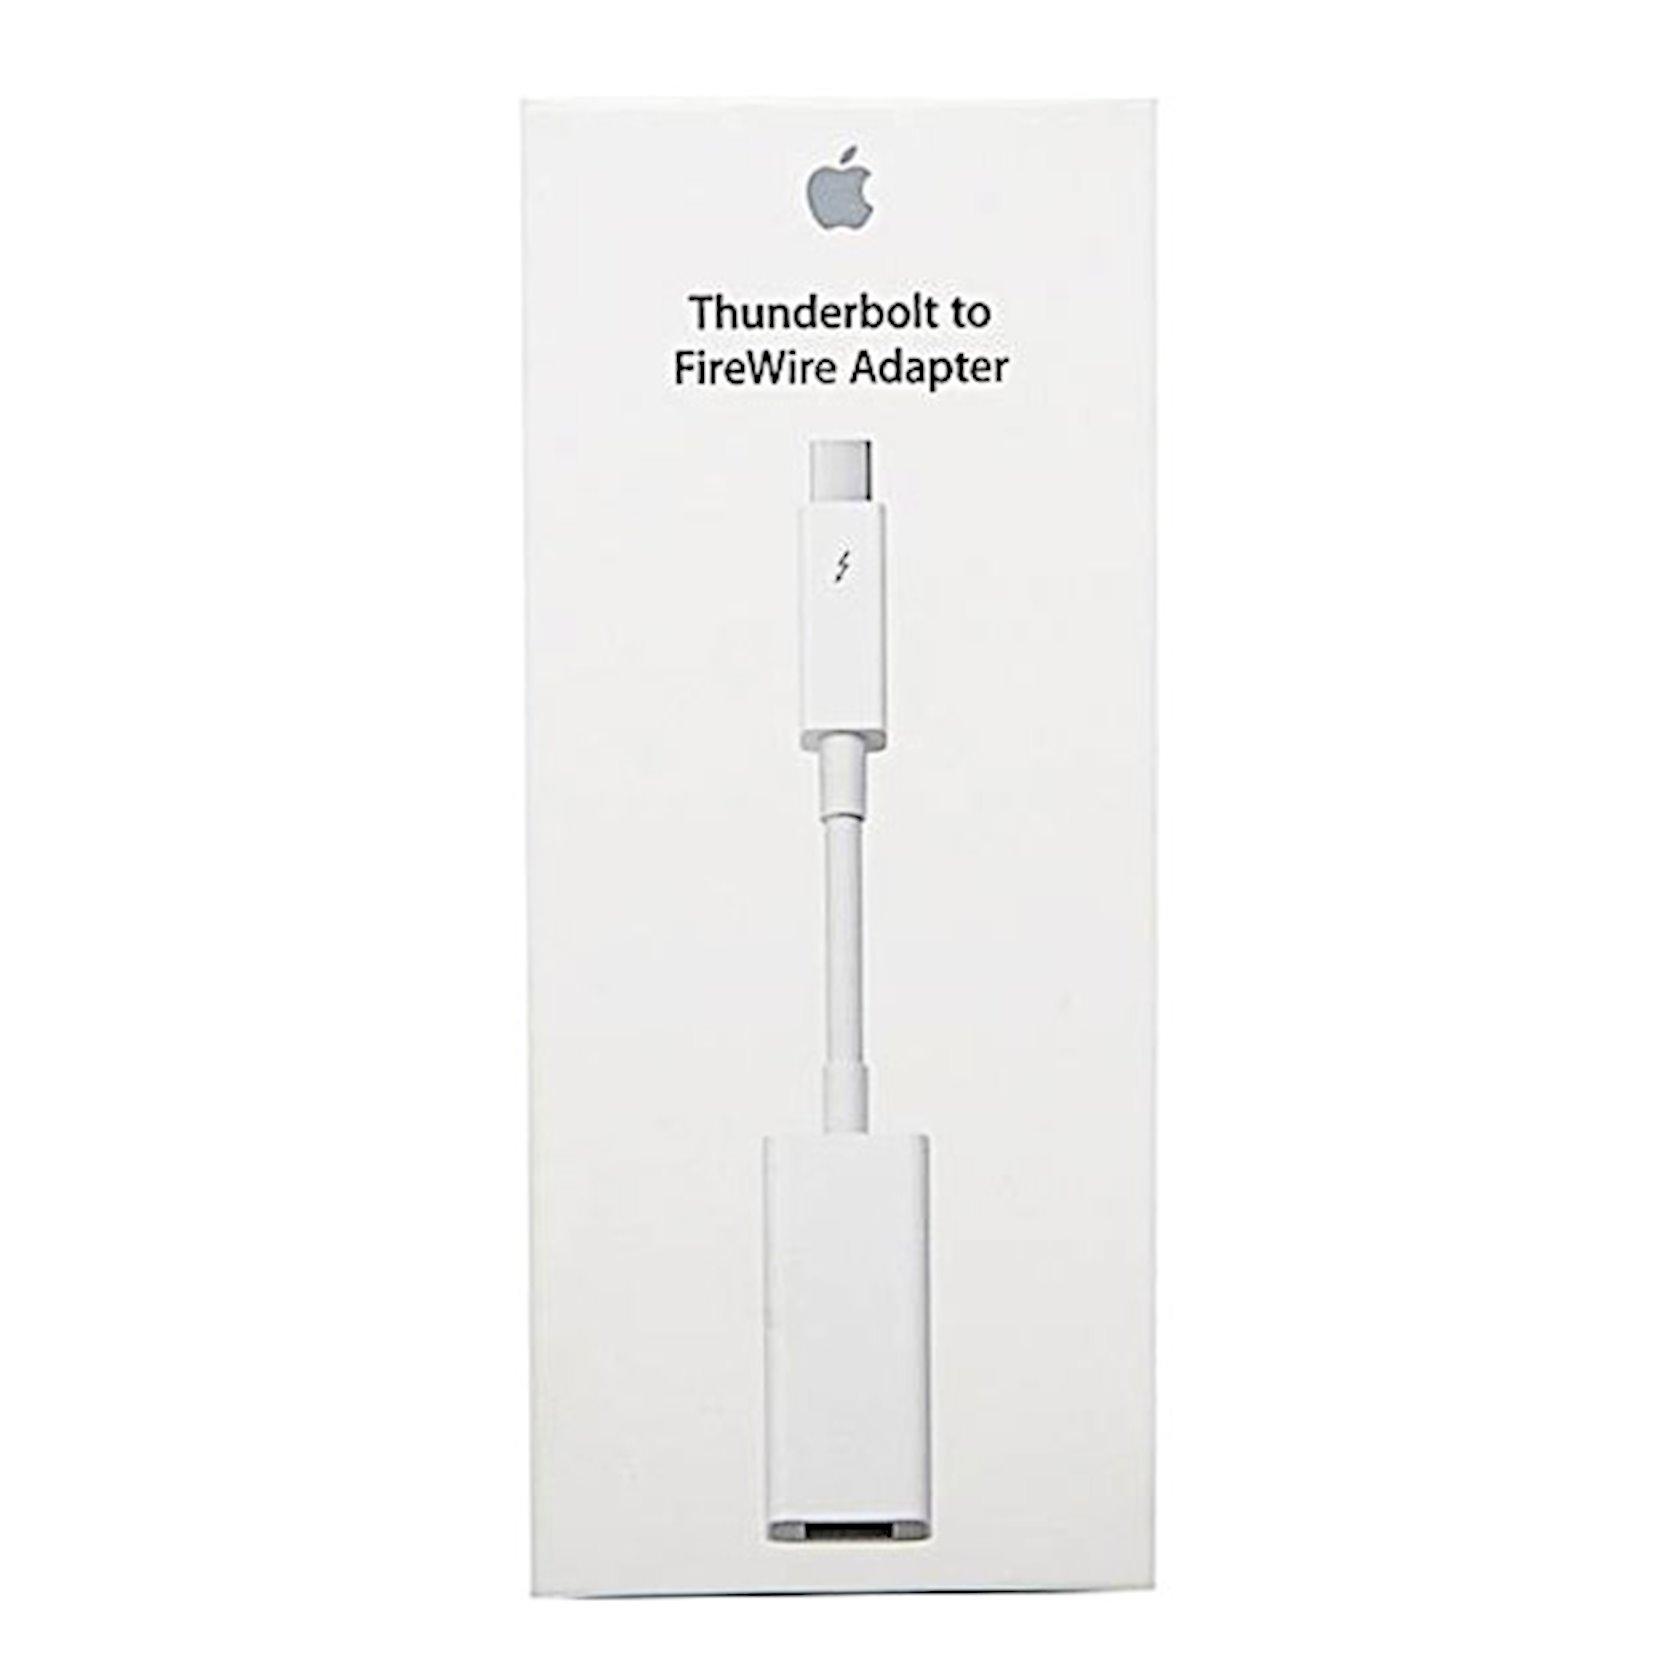 Adapter Apple Thunderbolt — FireWire